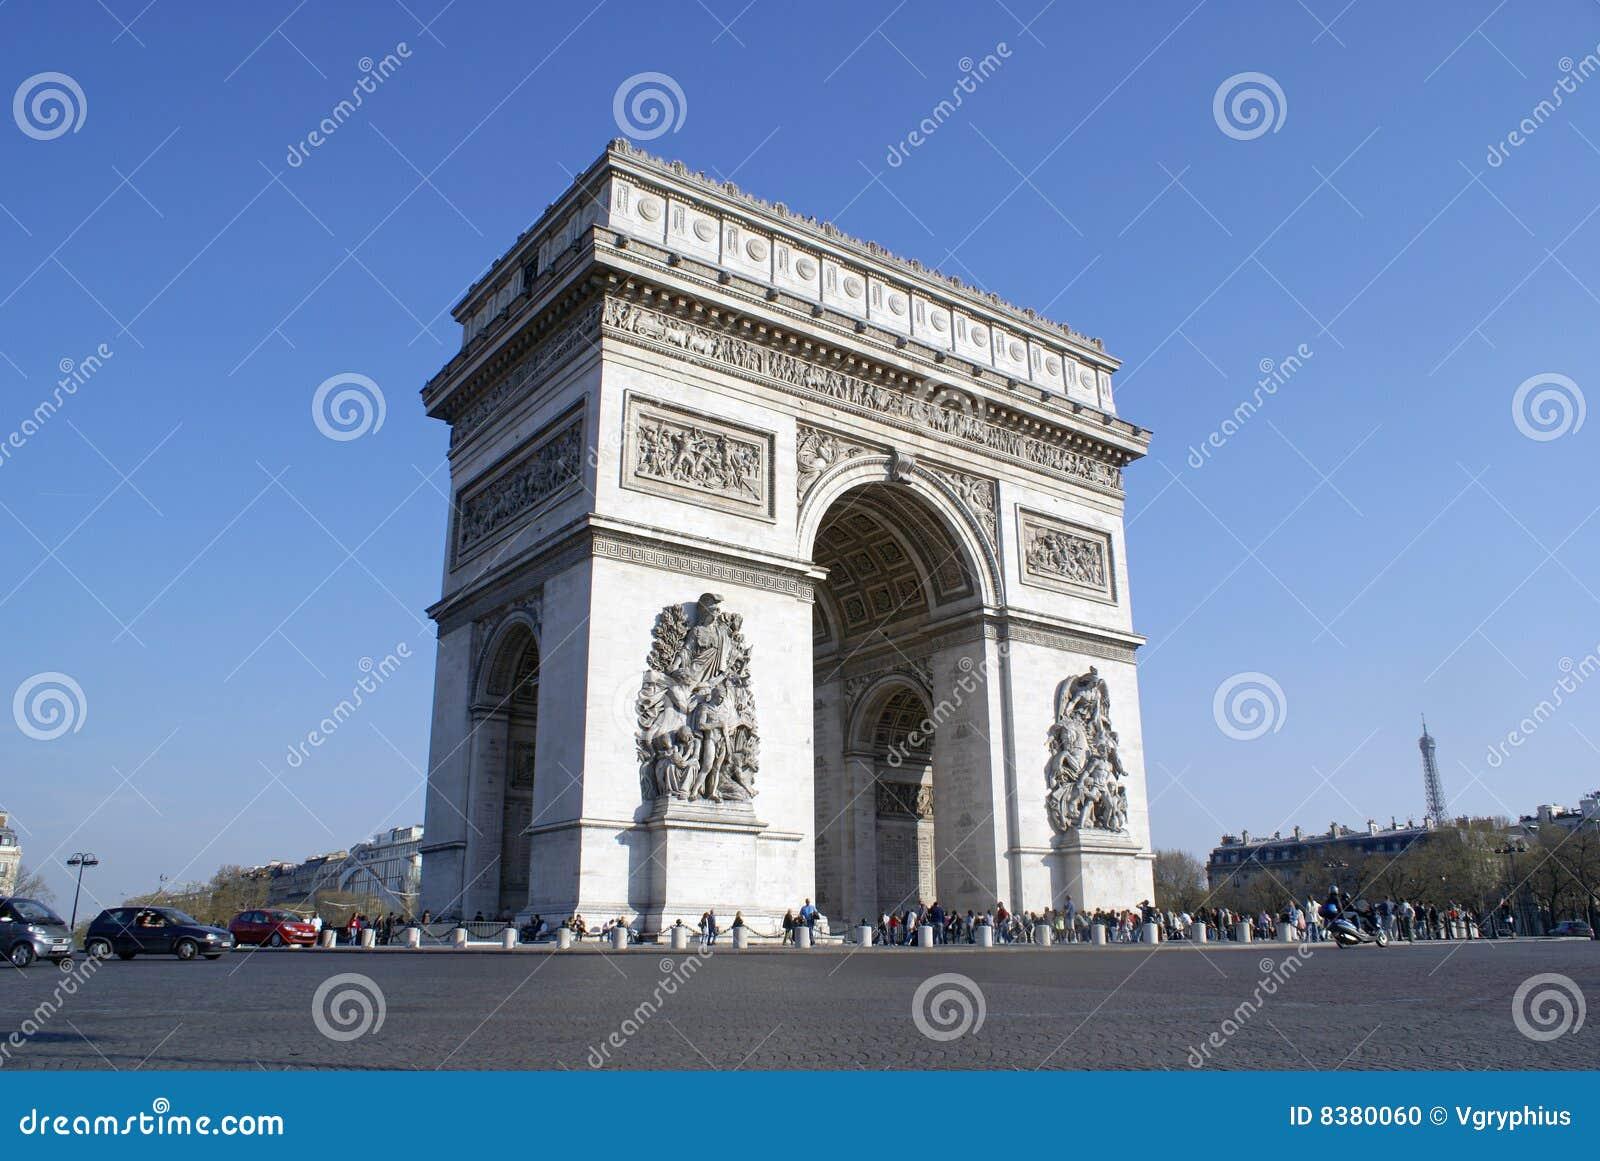 Arc de埃菲尔・巴黎塔triomphe